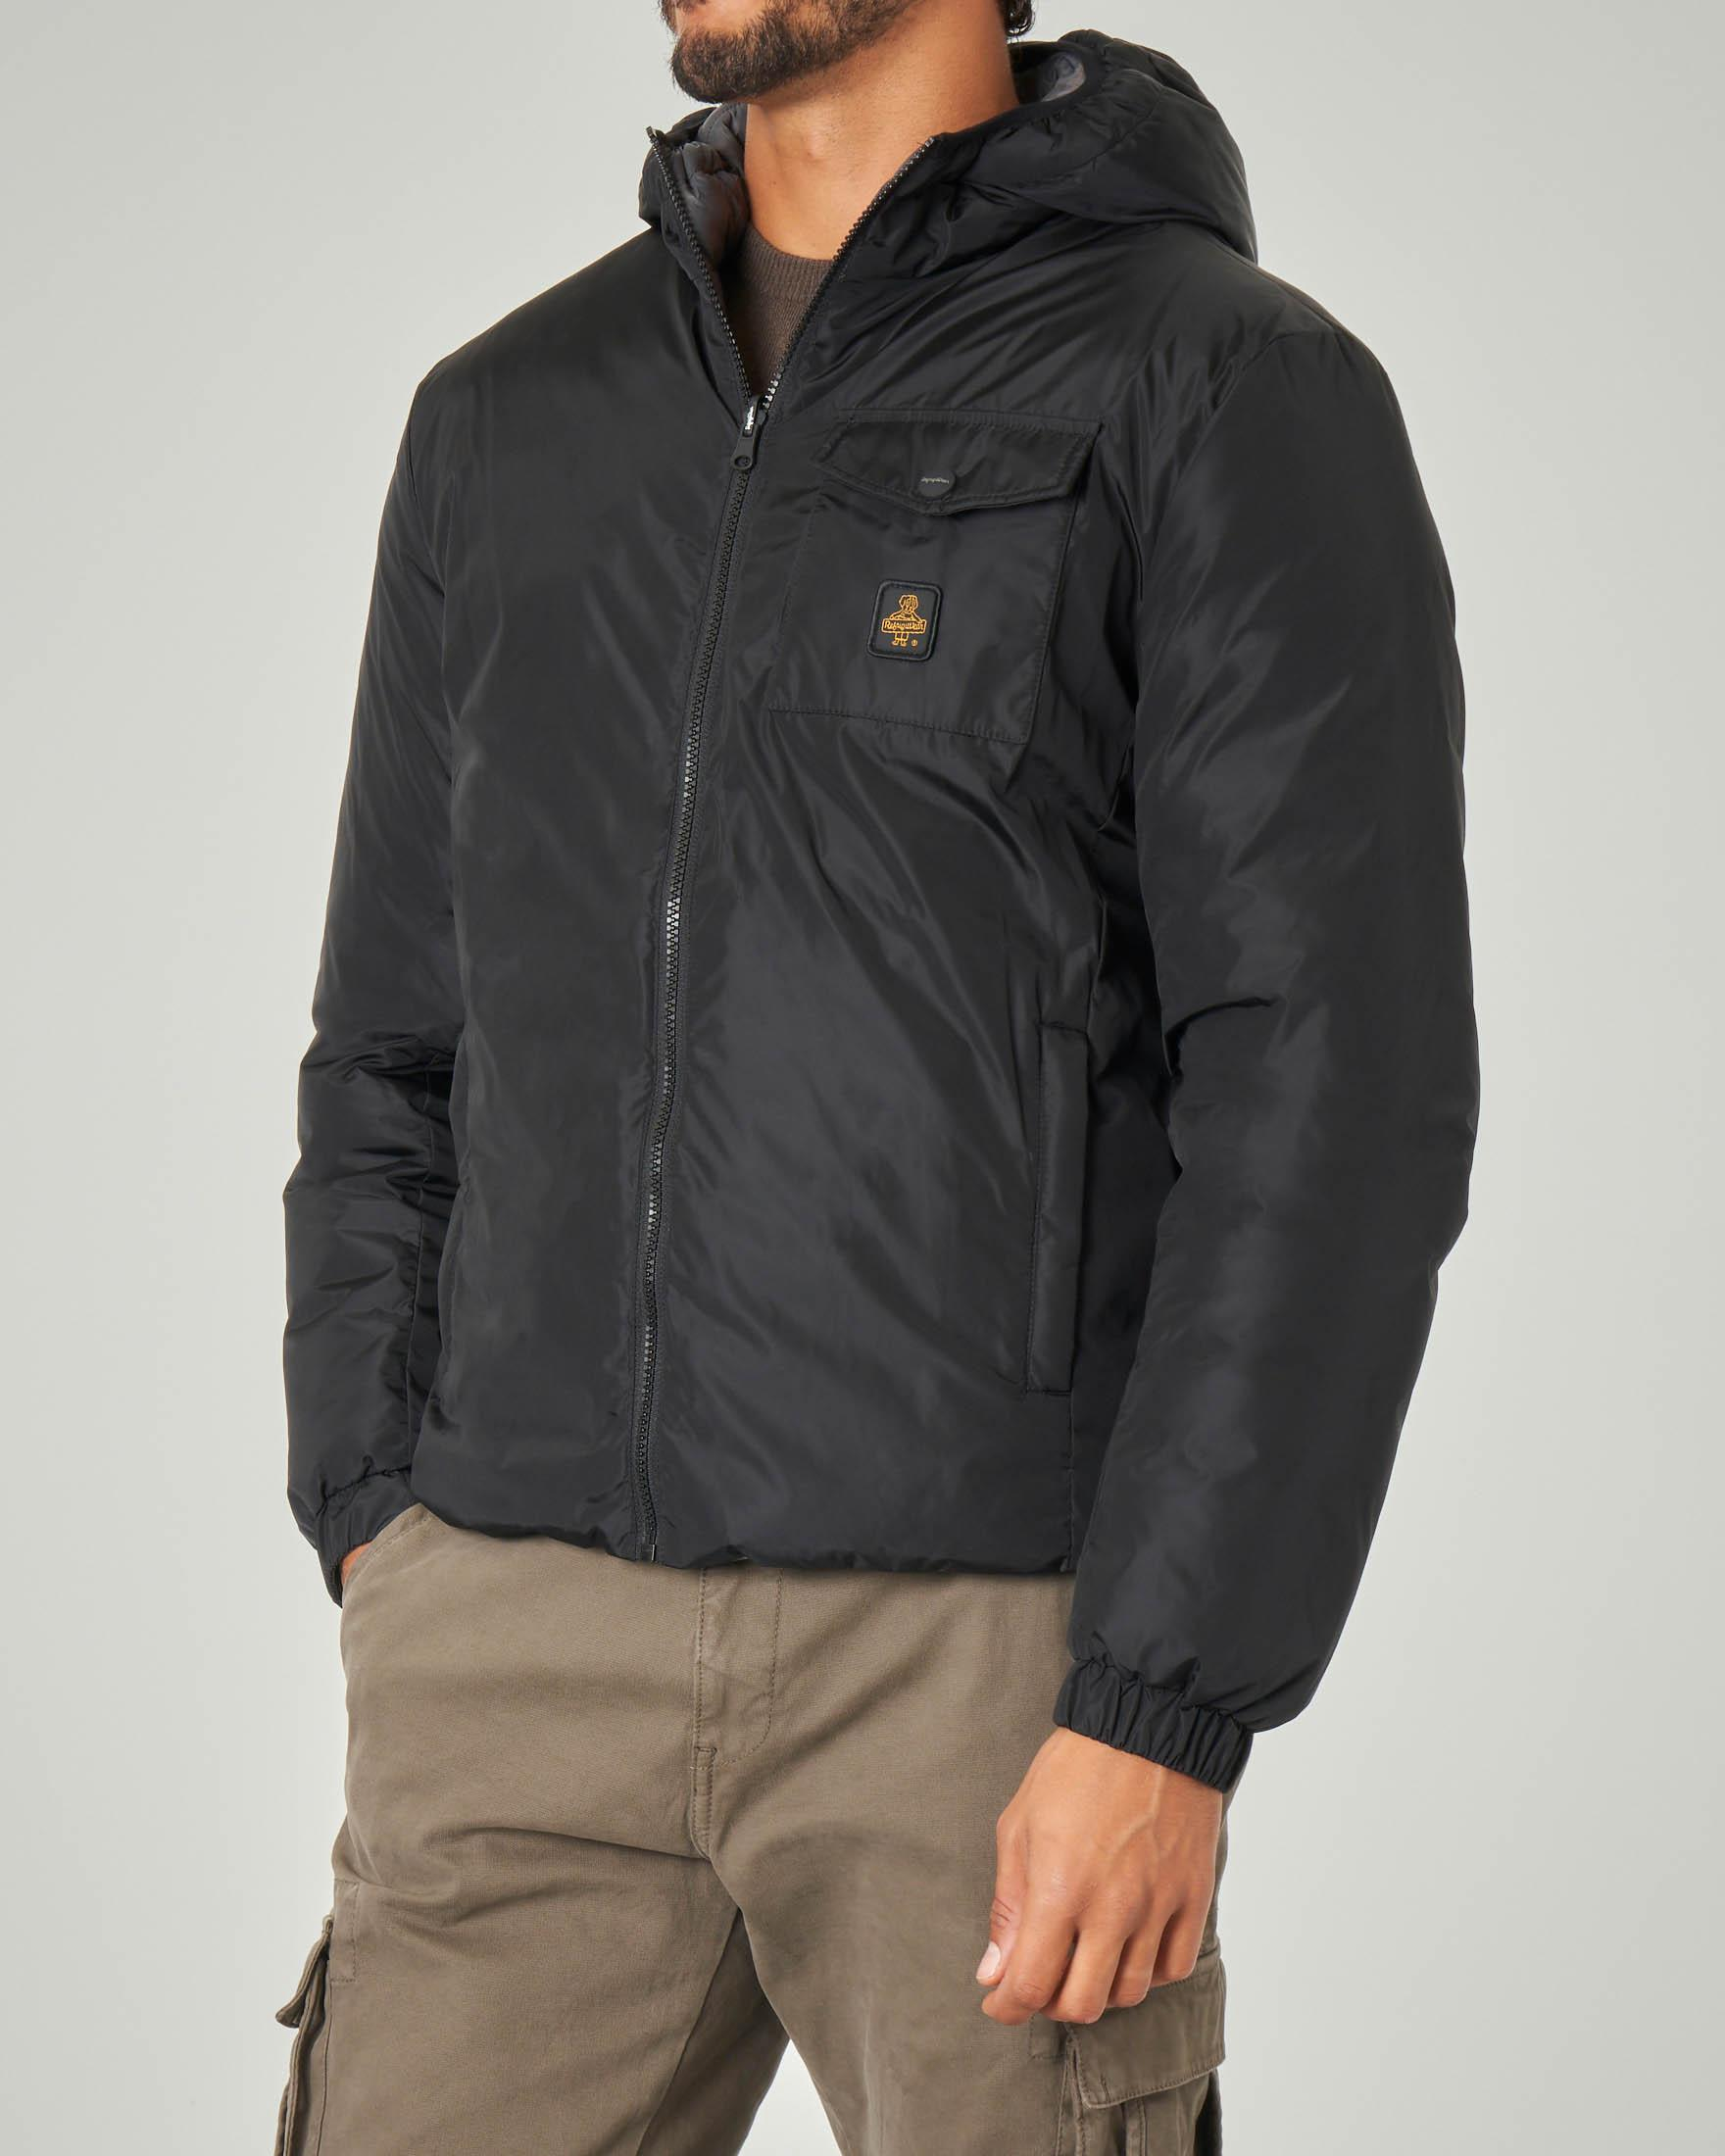 Midtown Jacket nera reversibile in piumino grigio